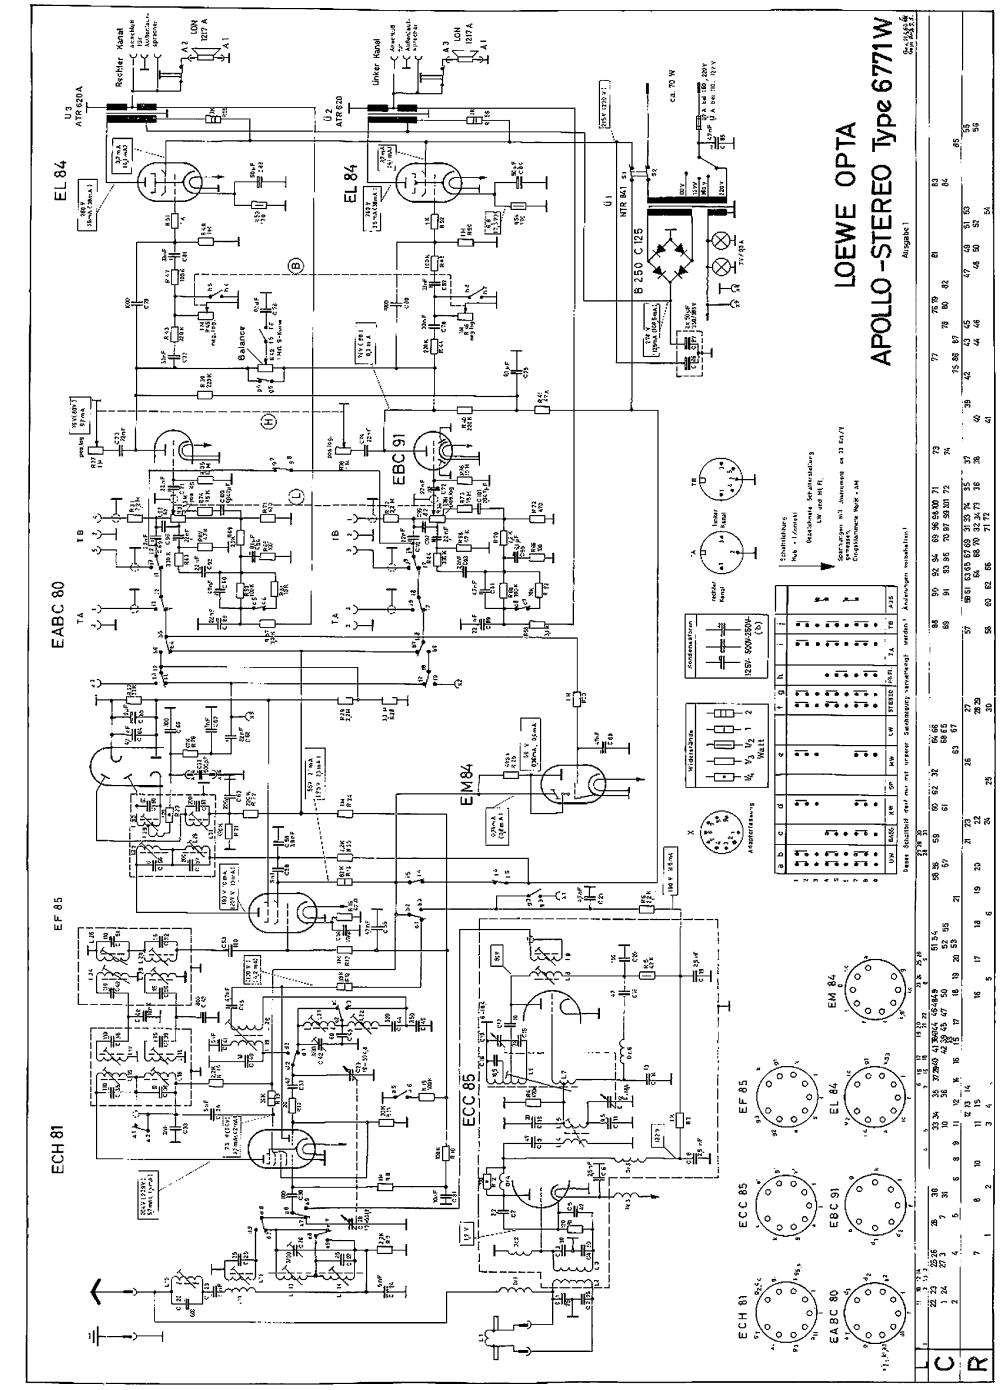 medium resolution of loewe opta apollo stereo 6771w 2xel84 am fm radio sch service manual